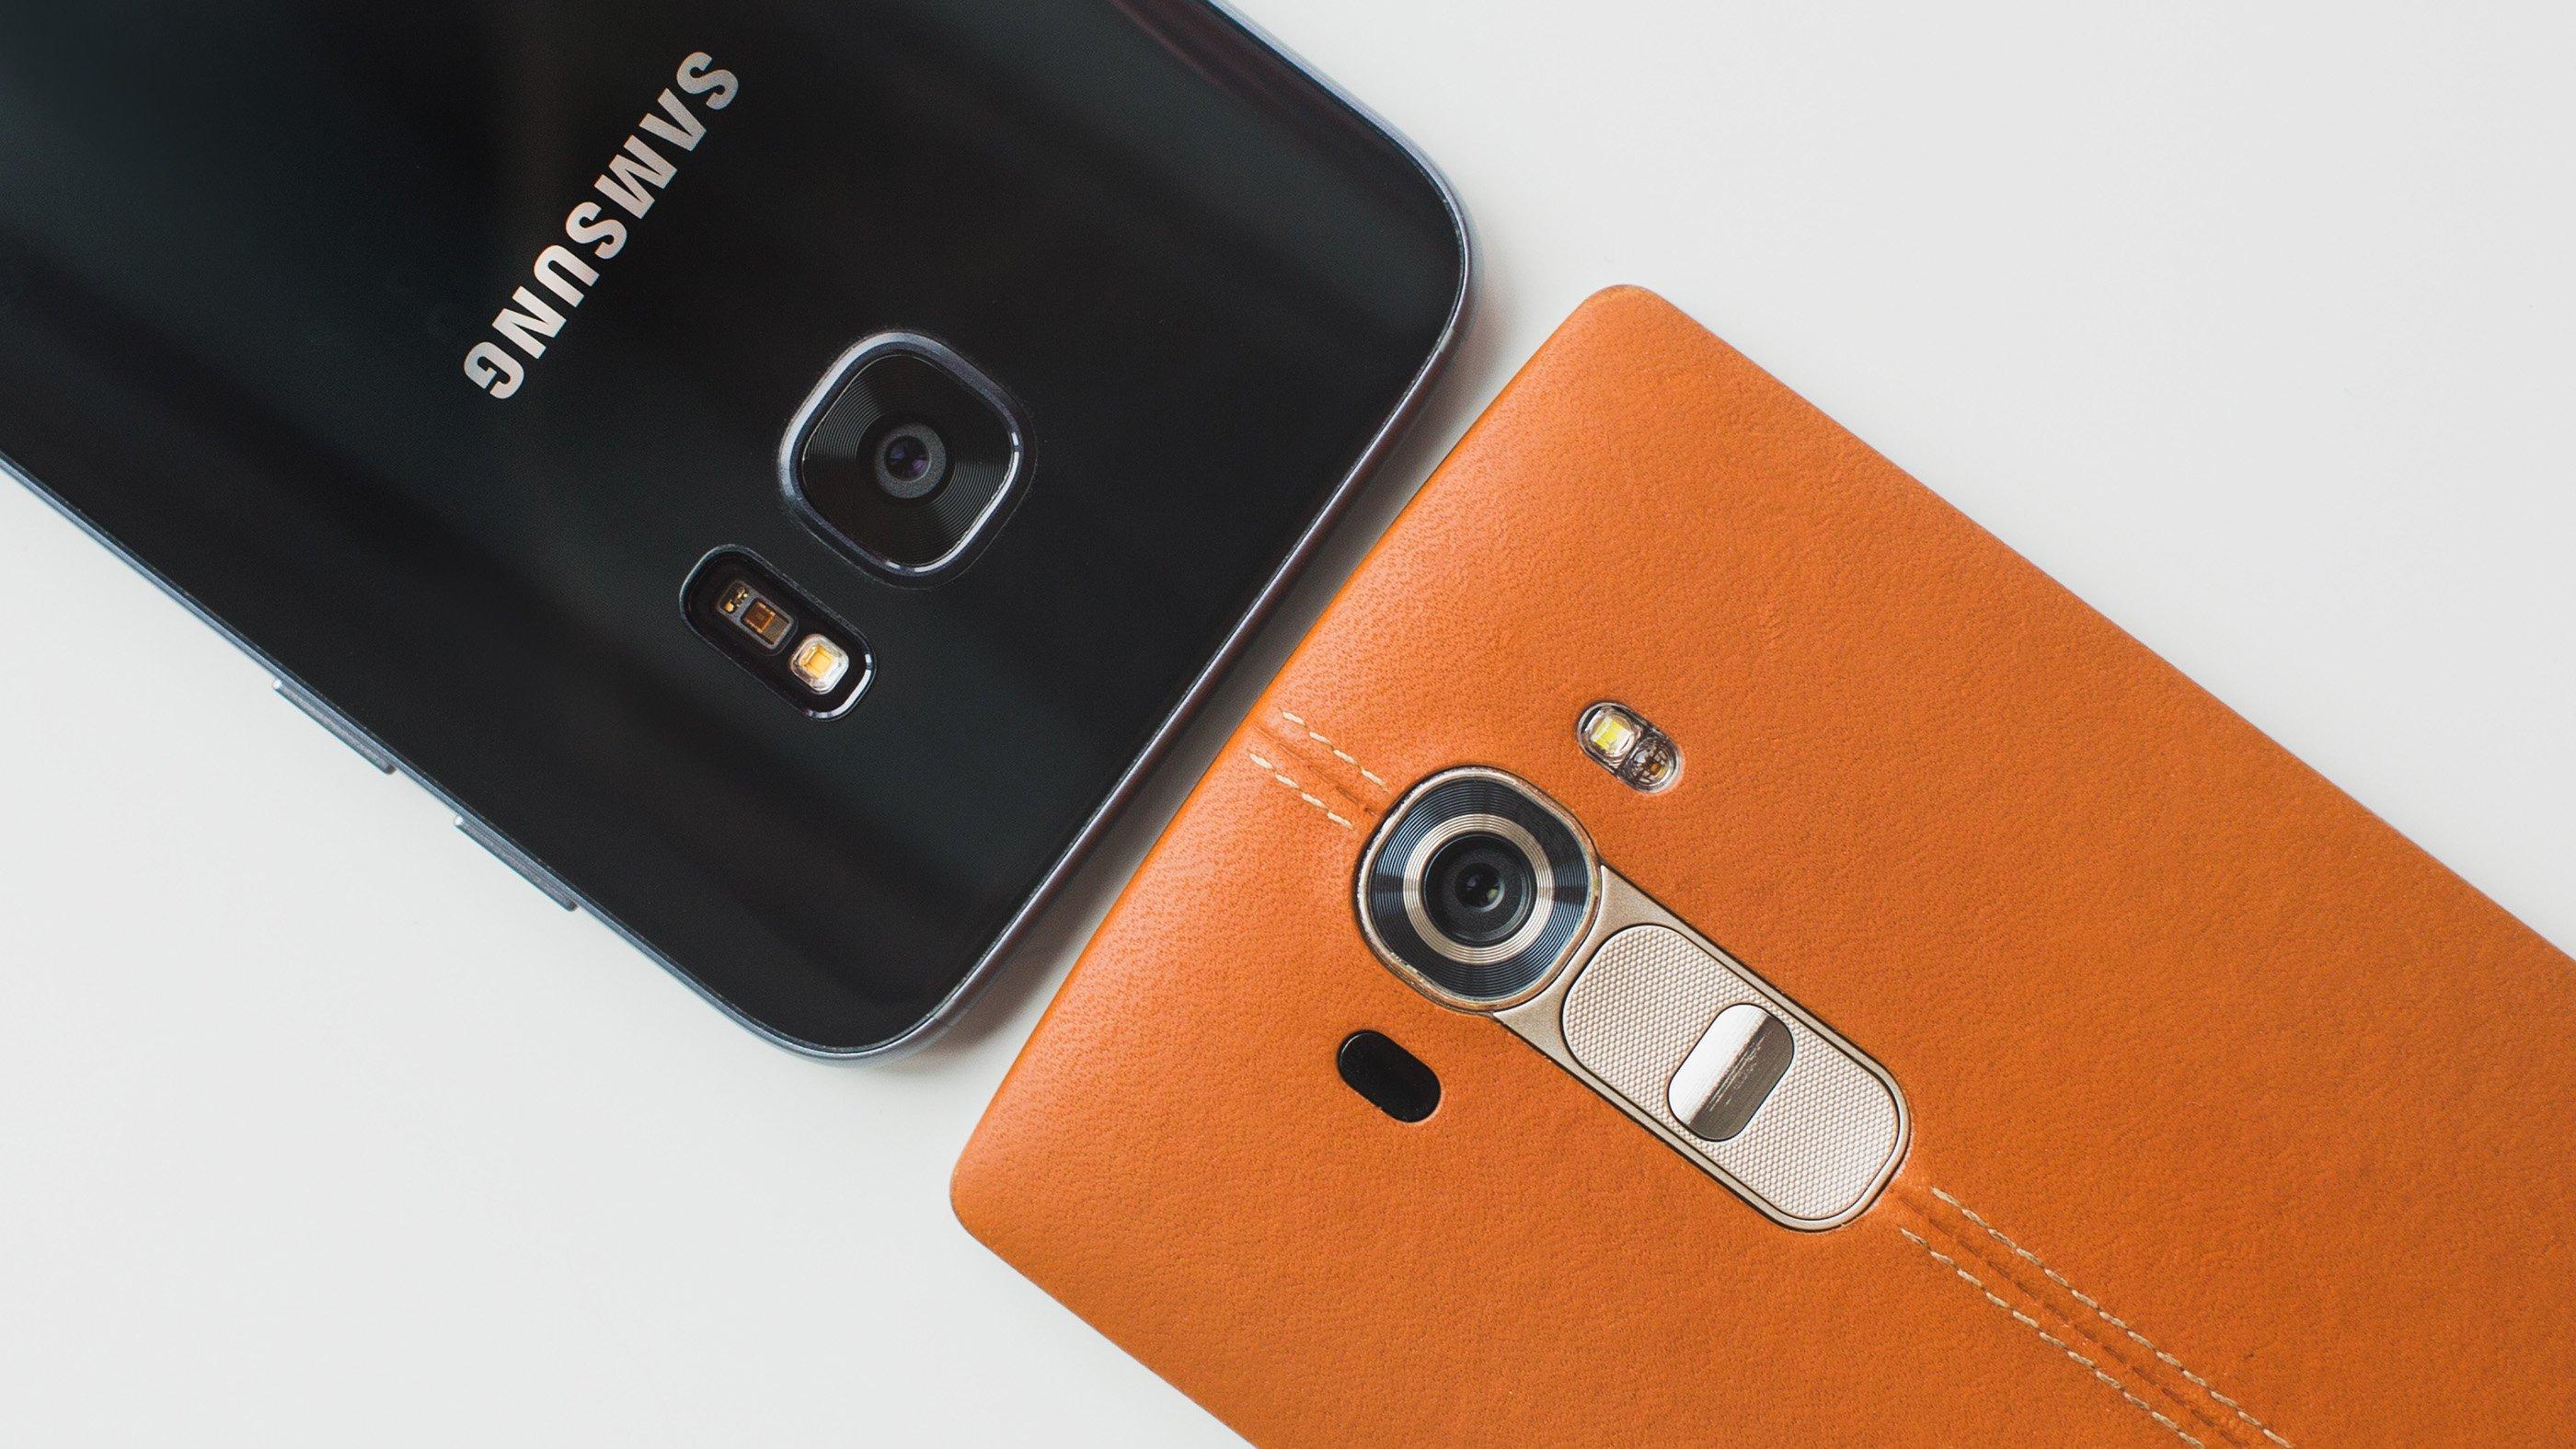 Comparación de cámaras: Samsung Galaxy S7 vs LG G4 | AndroidPIT